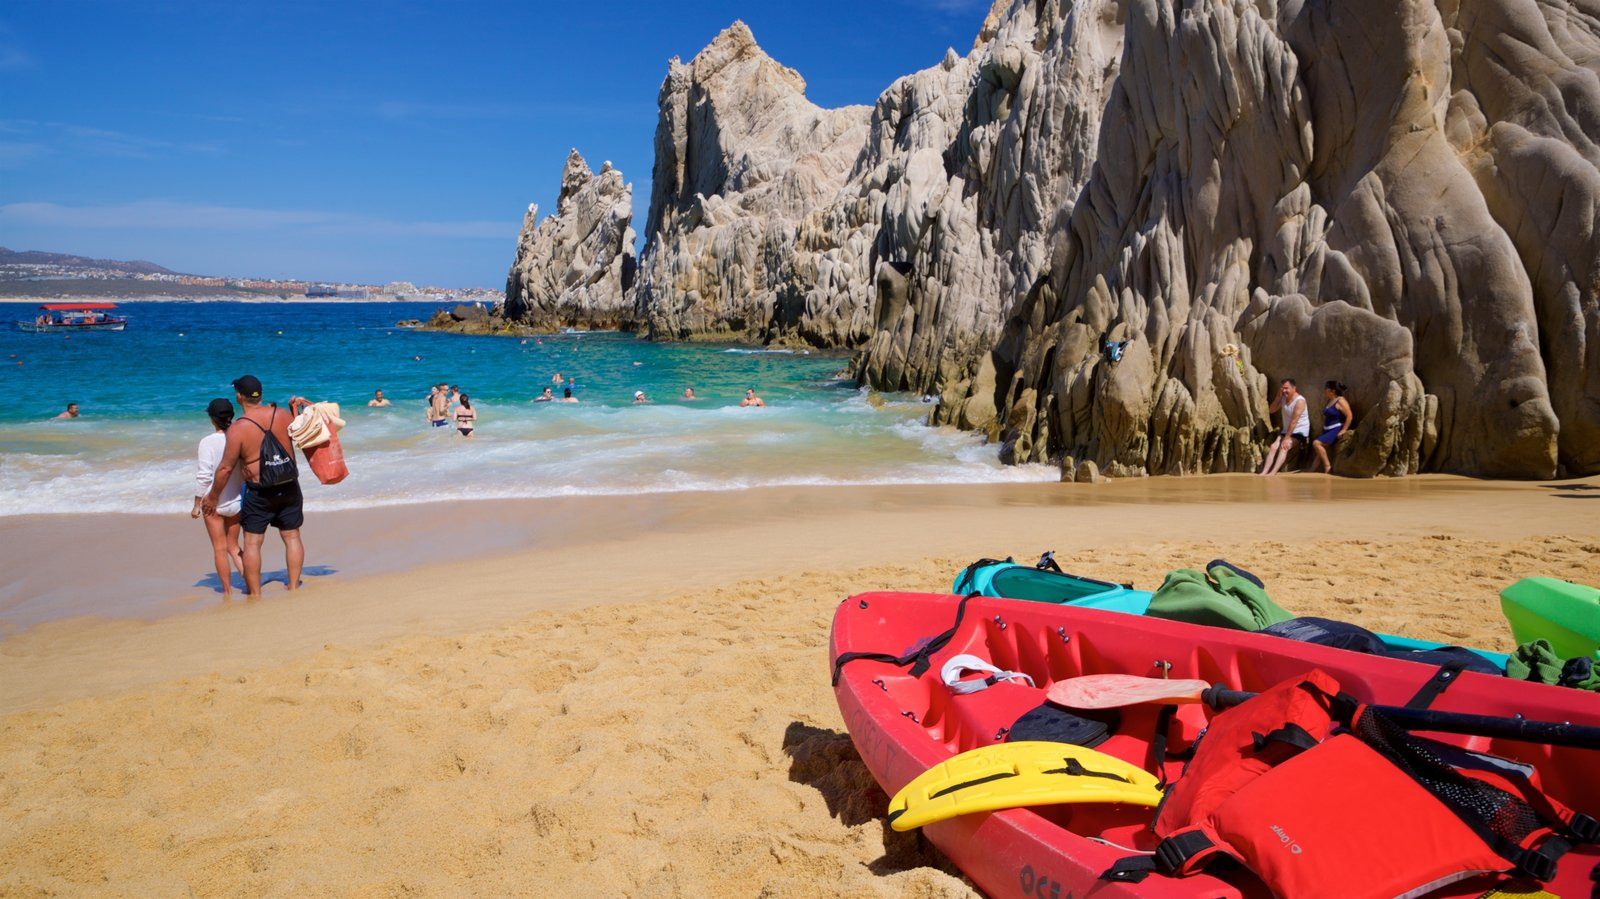 Playa del Amor which includes a sandy beach, rugged coastline and general coastal views